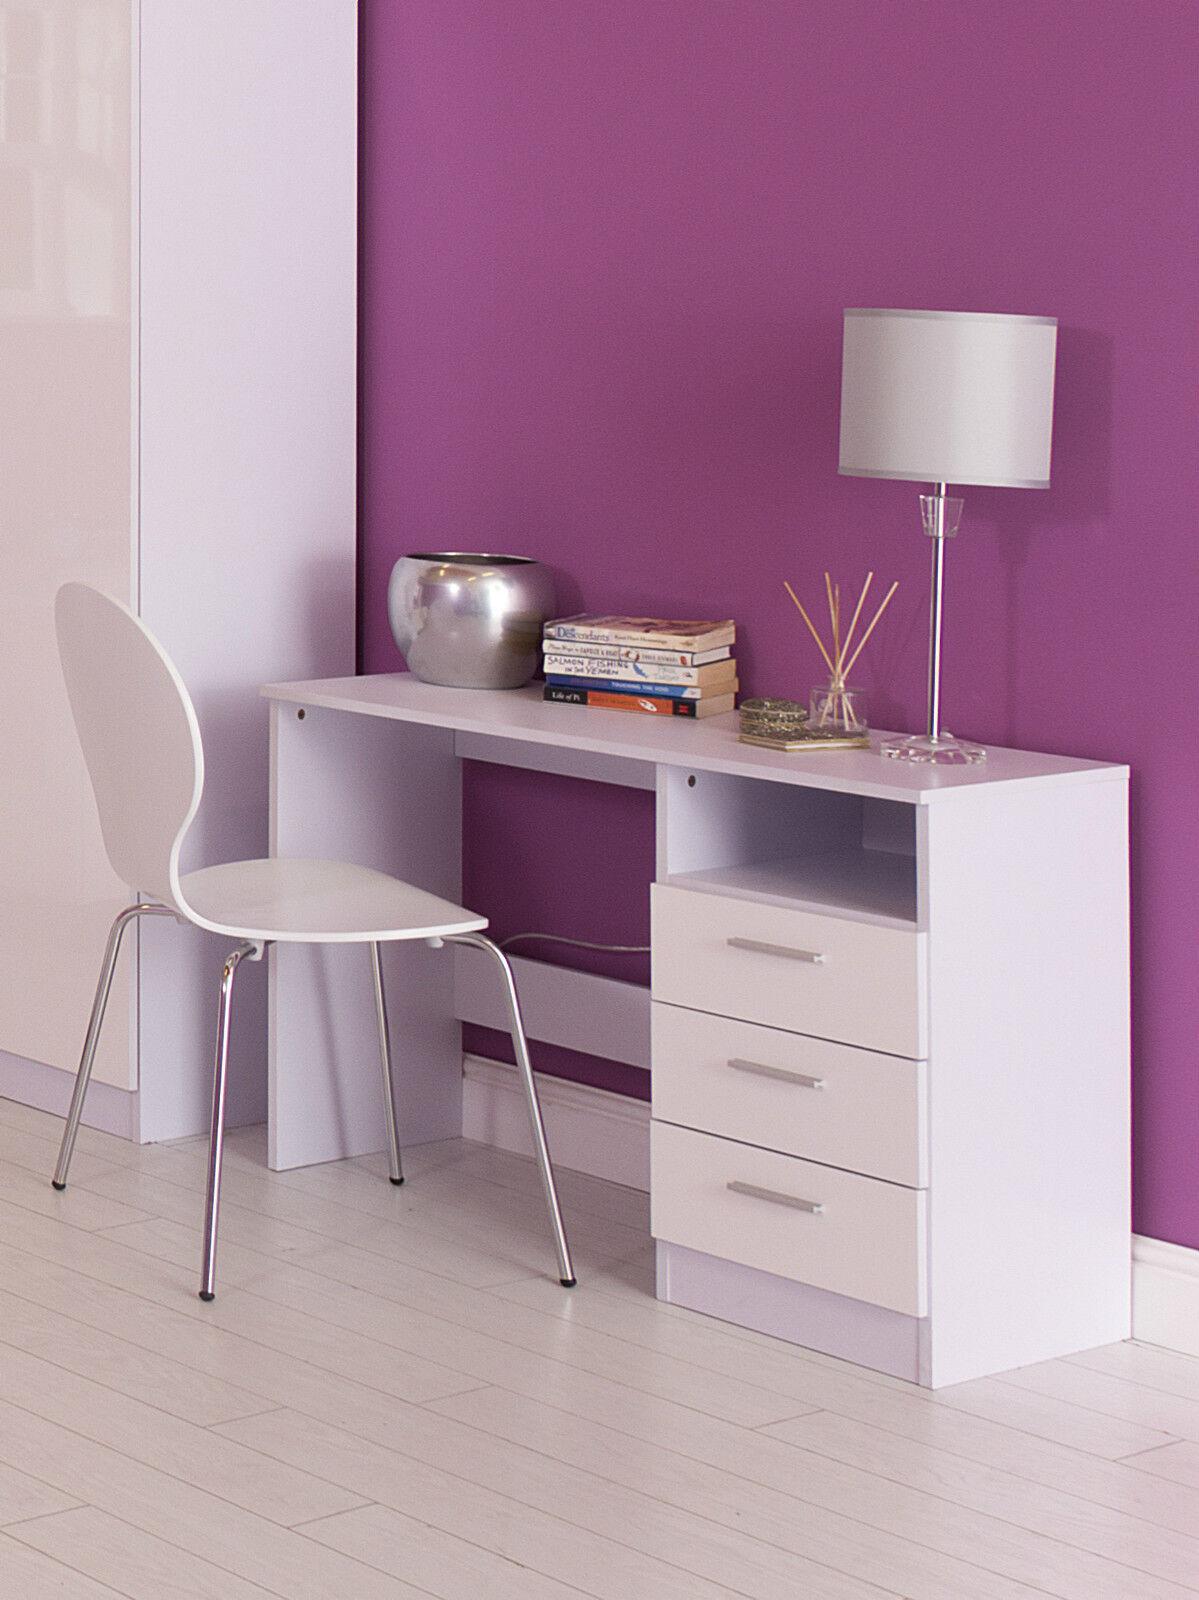 Ottowa white gloss 3 drawer study desk dressing table for White dressing table with drawers